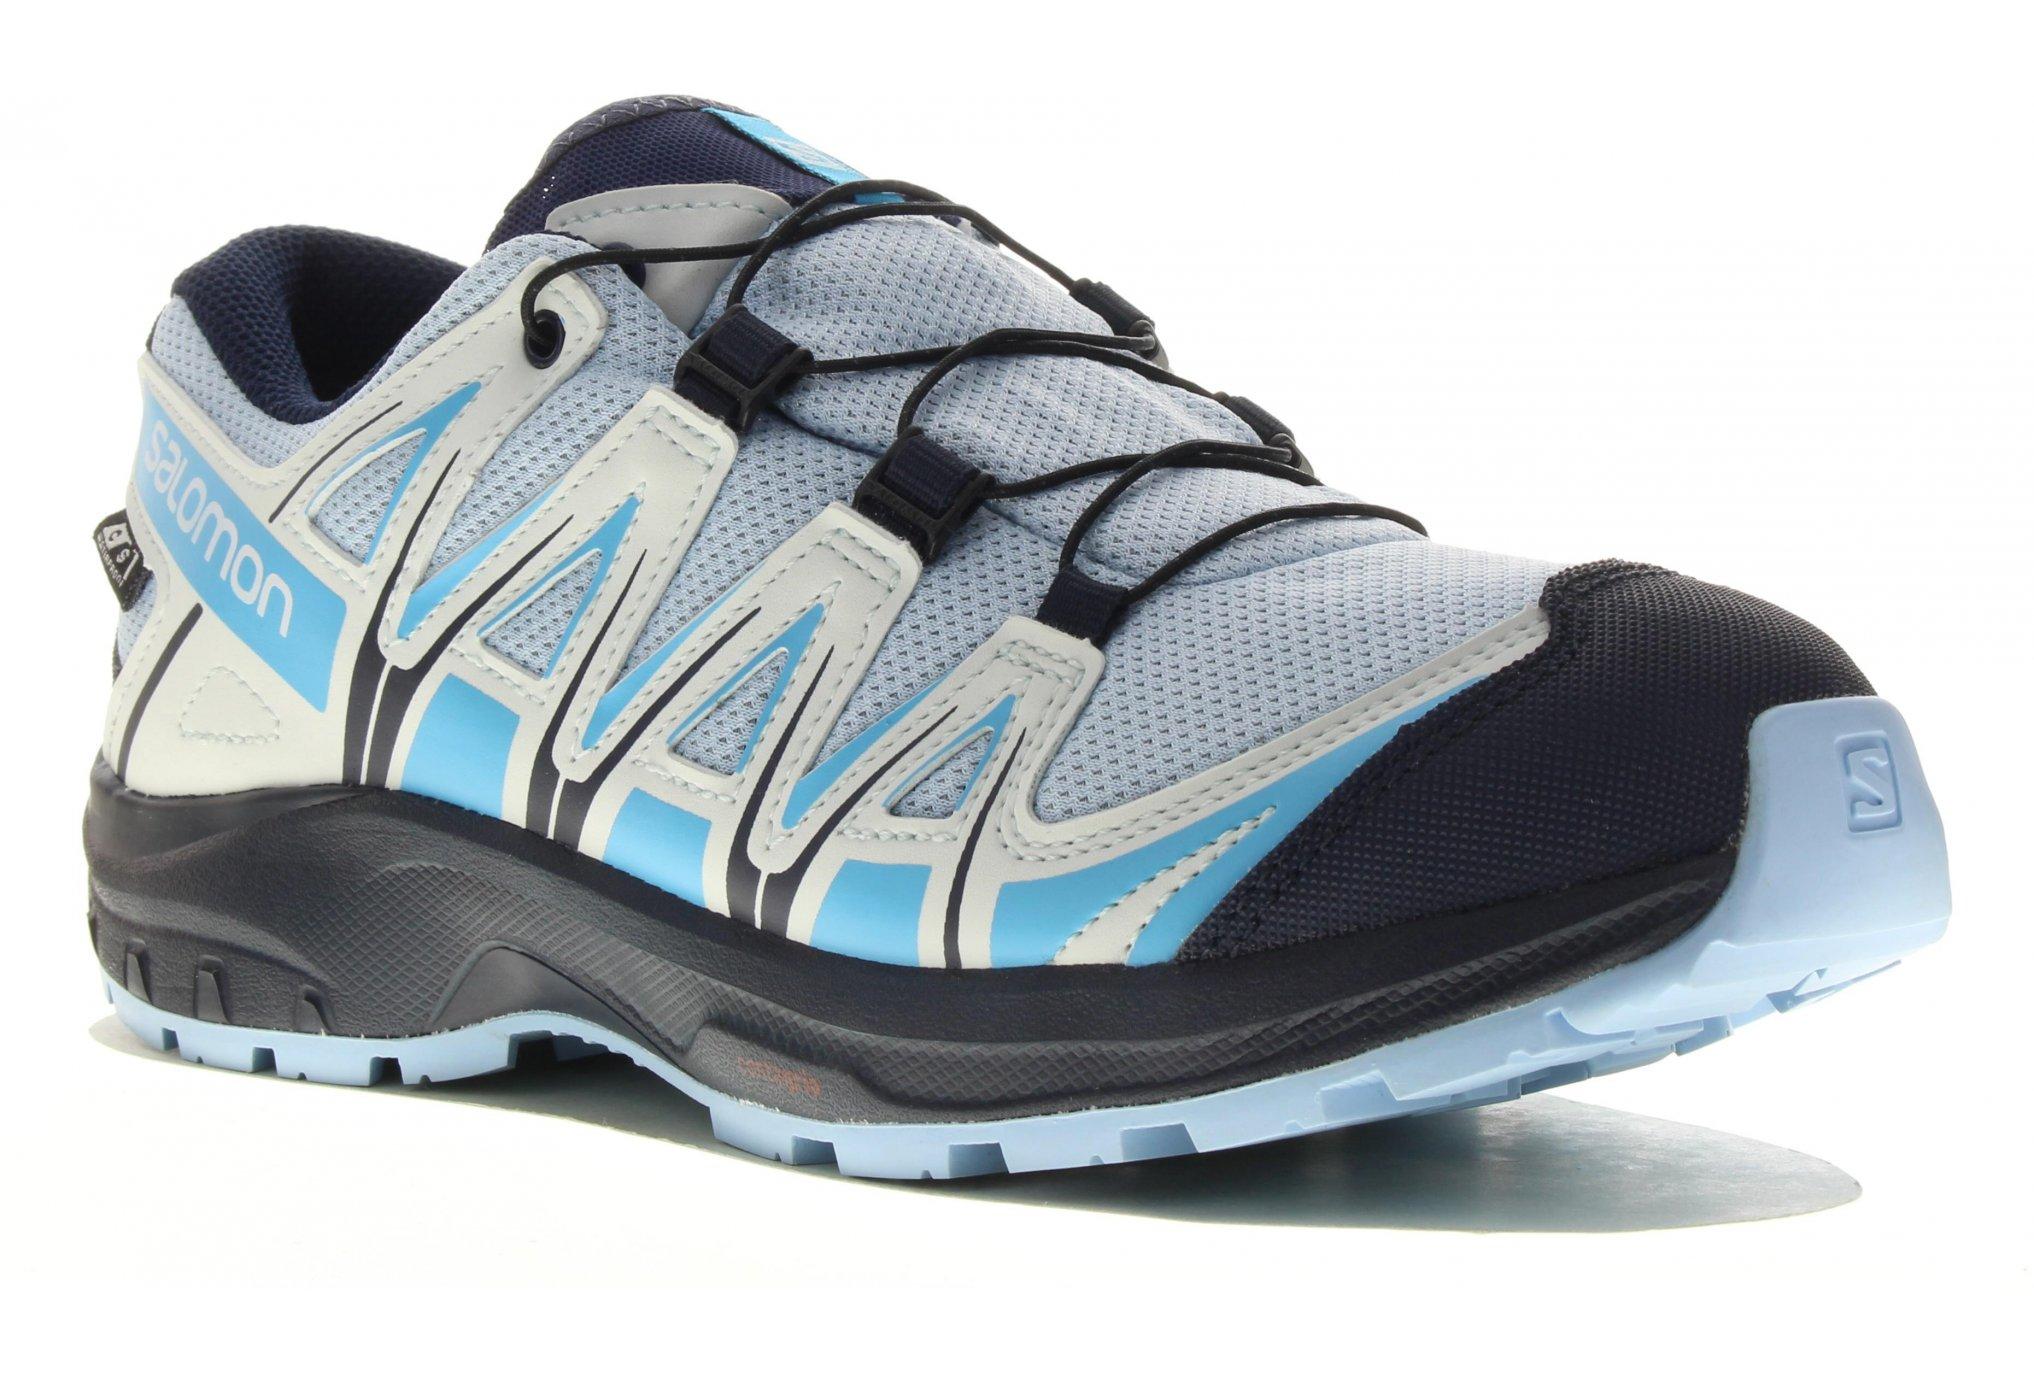 Salomon XA PRO 3D CSWP Fille Chaussures running femme